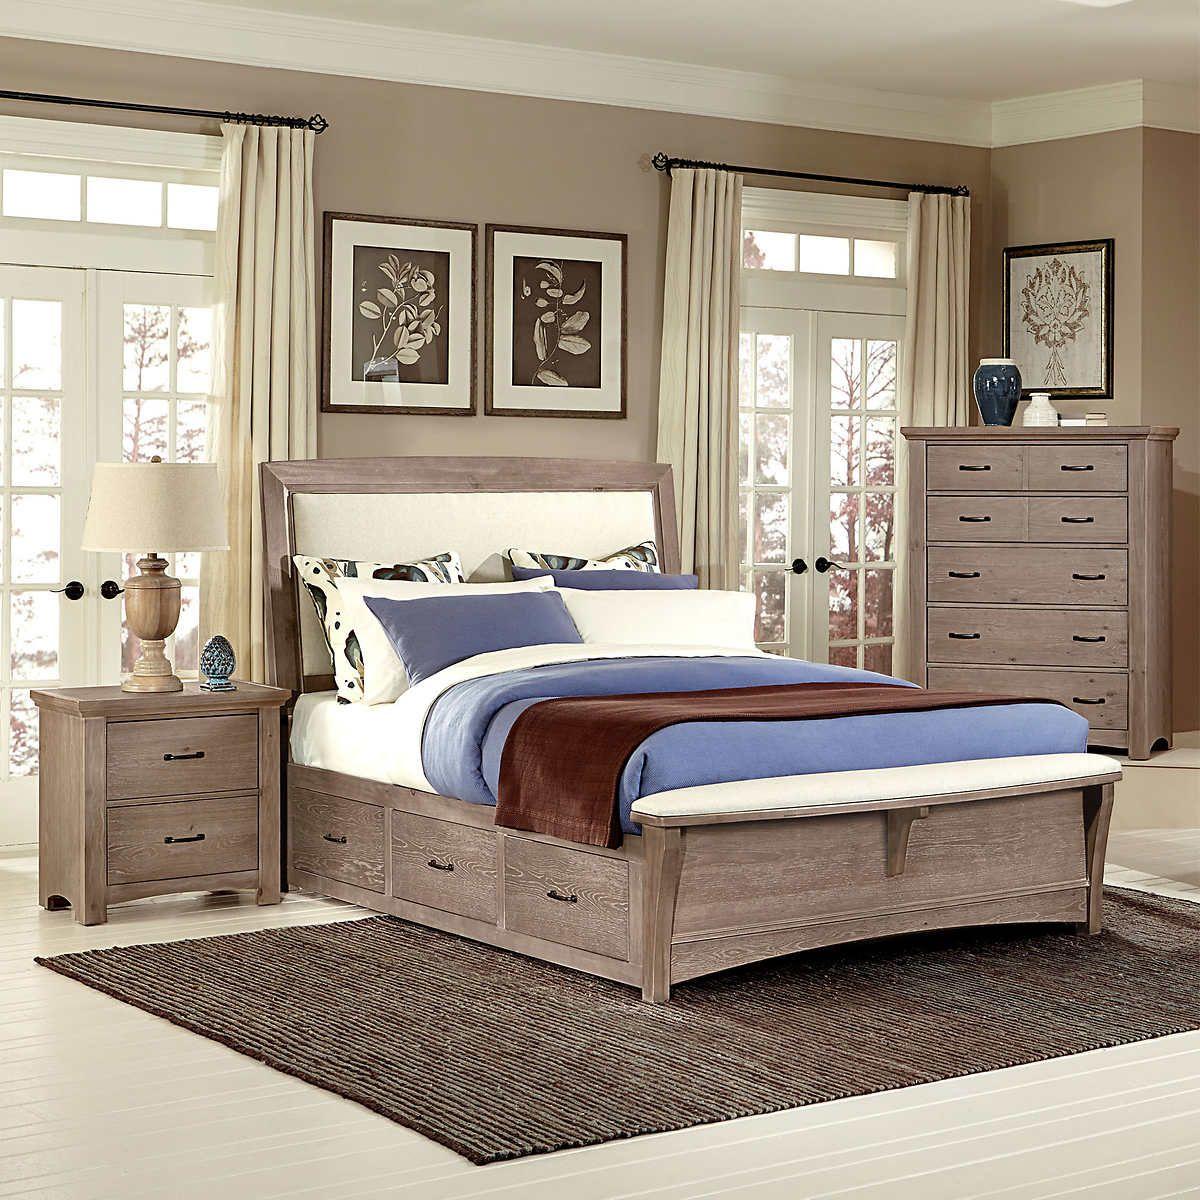 Chambers dual storage 4piece king bedroom set master